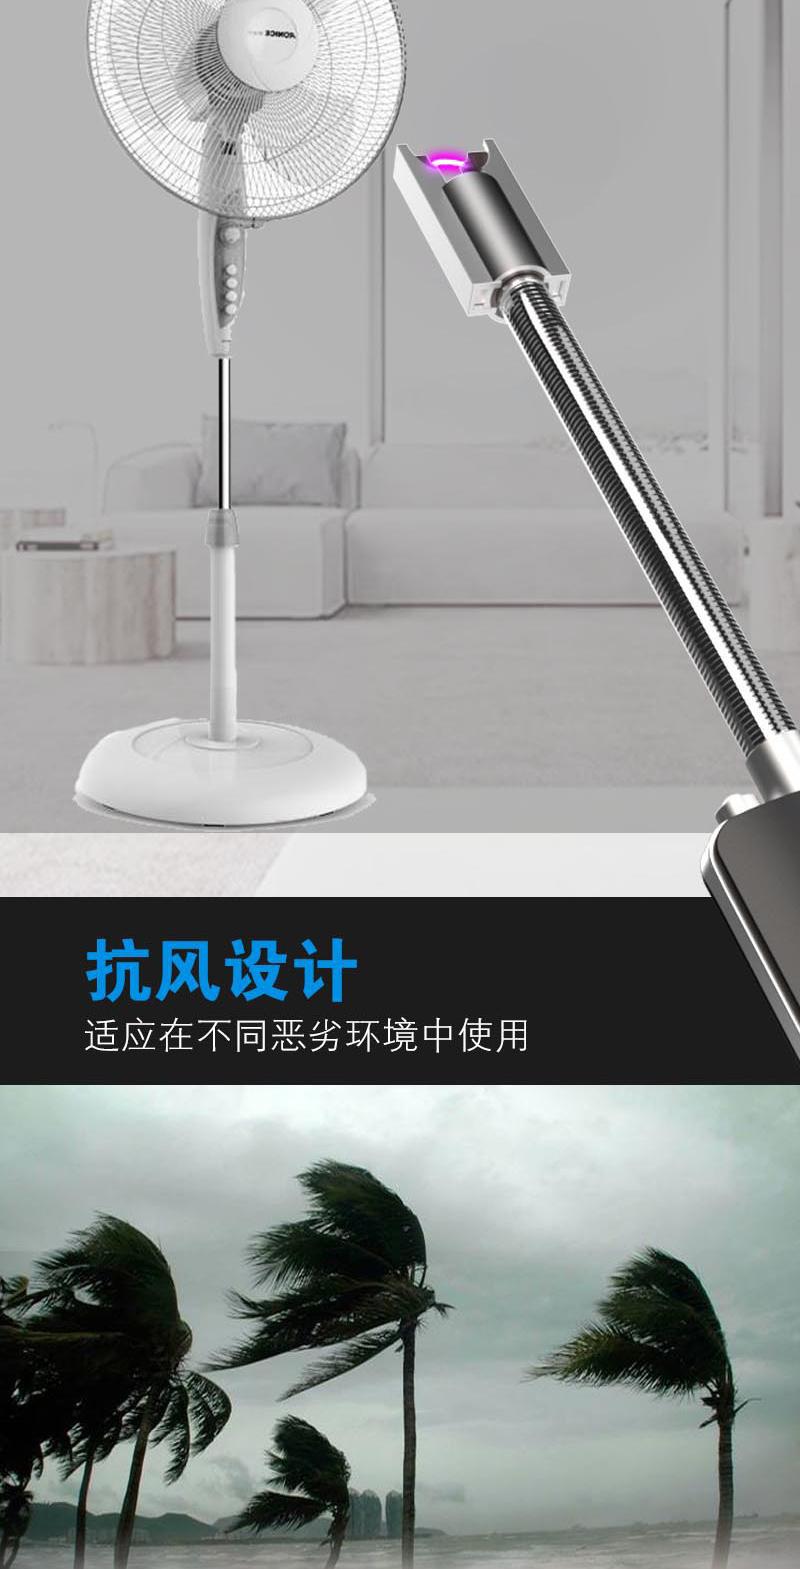 TW-903型电弧点火器介绍图_09